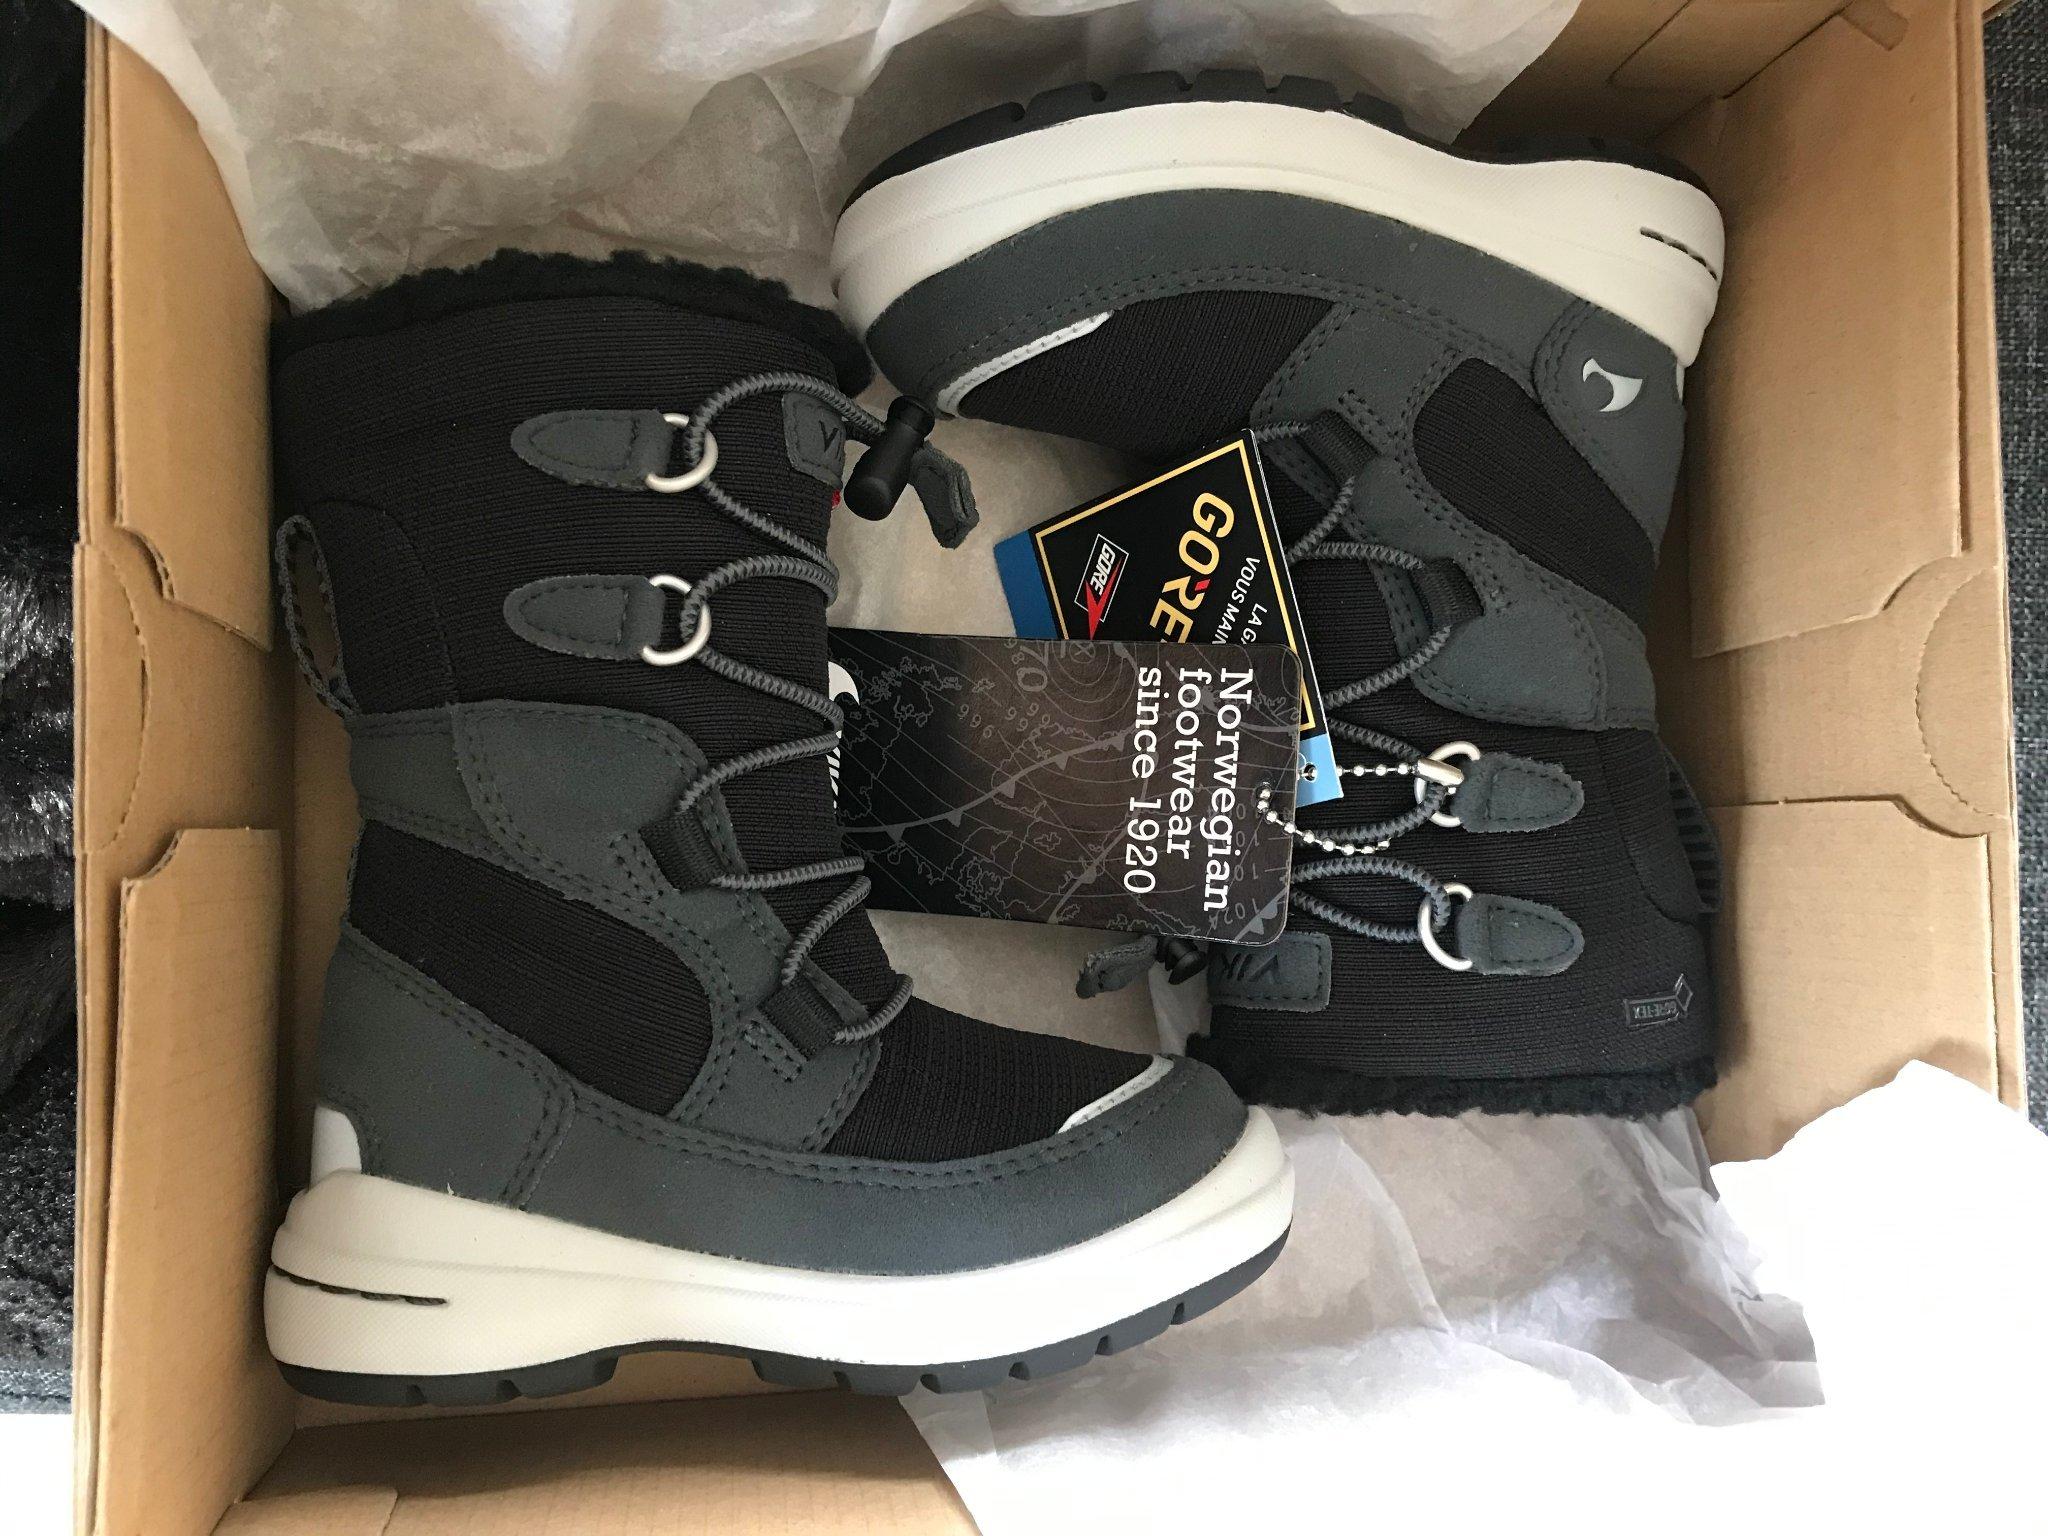 VIKING TOTAK GTX stövlar kängor boots storlek 2.. (418576787